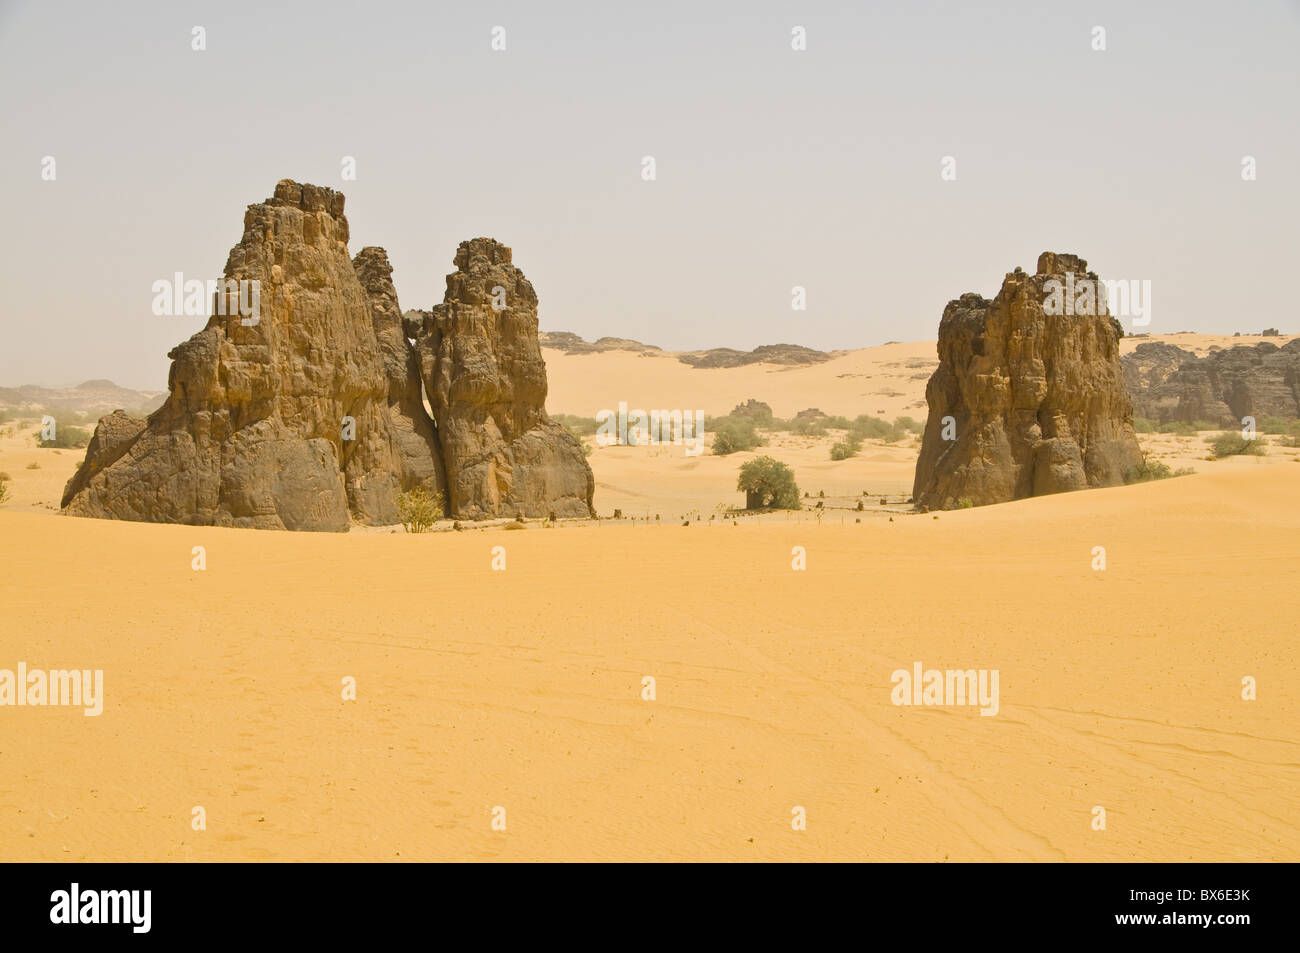 Strange rock formation La Vache Qui Pleure (the cow that cries), near Djanet, Algeria, North Africa, Africa - Stock Image